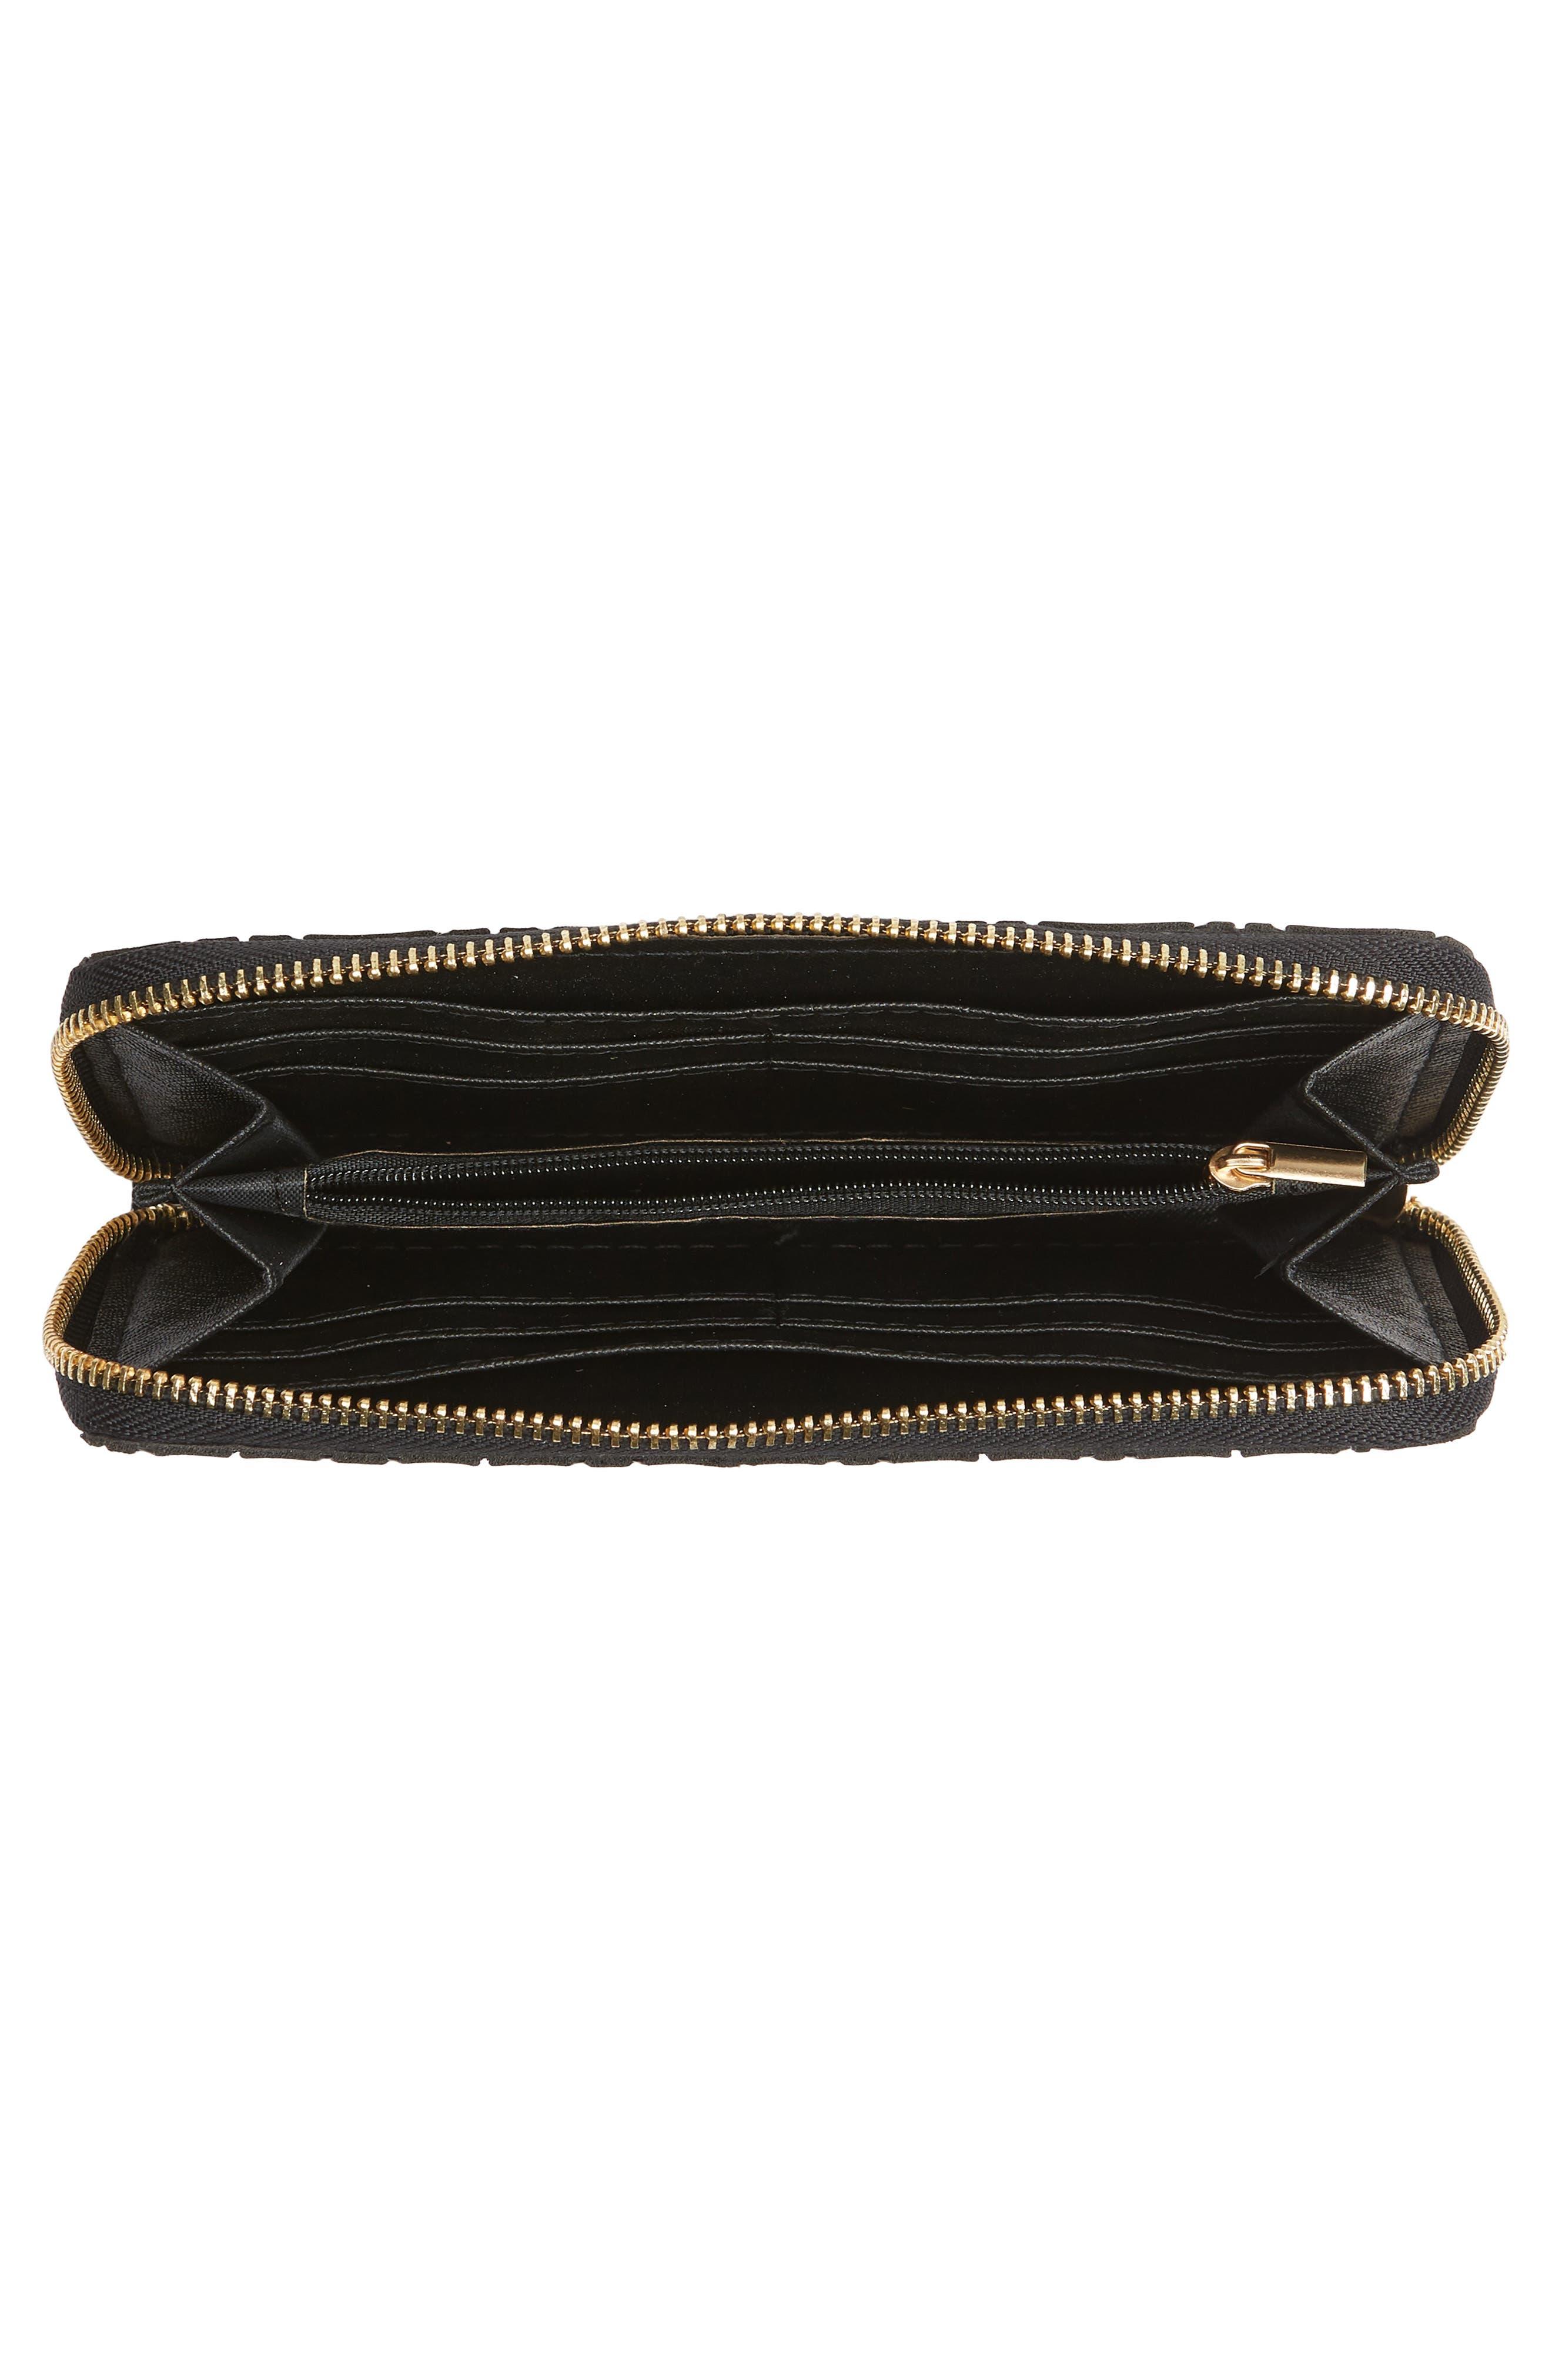 YOKI BAGS, Diamond Embossed Faux Leather Zip Wallet, Alternate thumbnail 5, color, 040